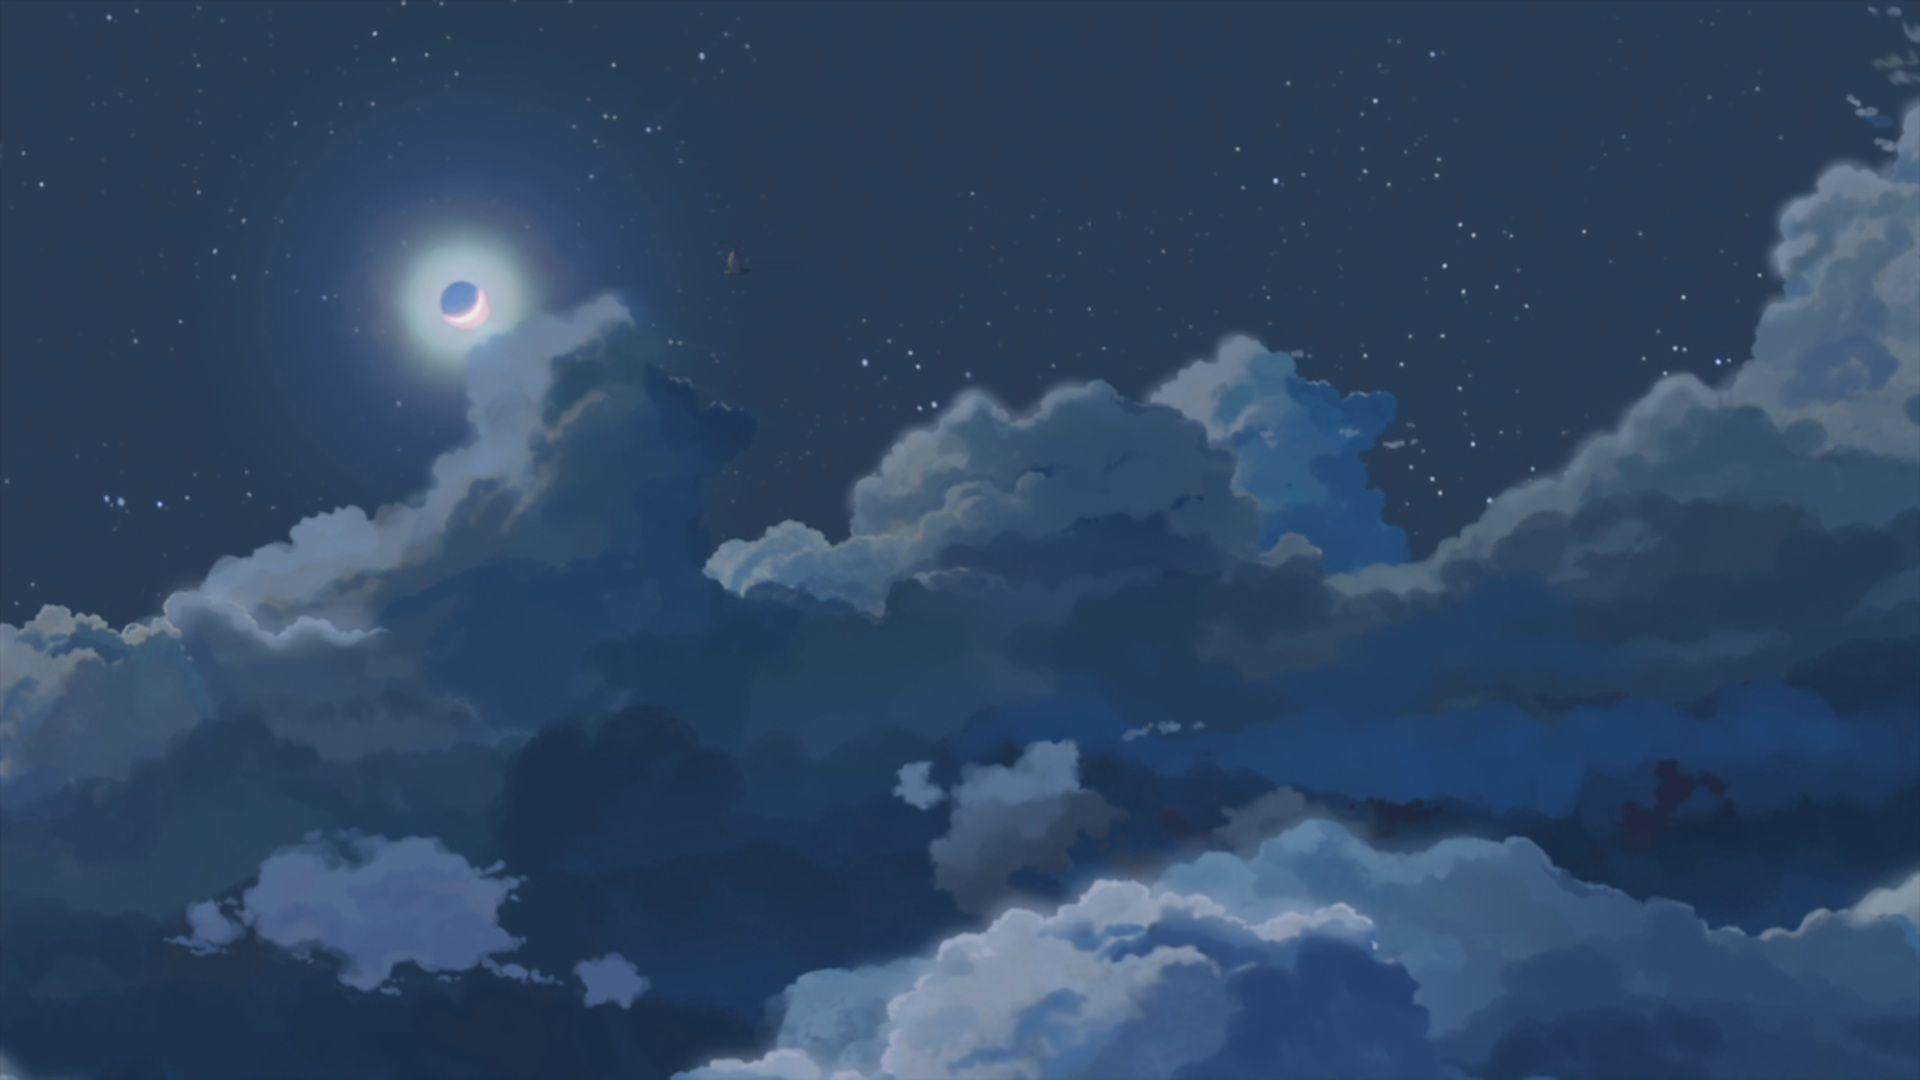 Hires Anime Wallpaper Windows Theme Anime Pinterest Anime